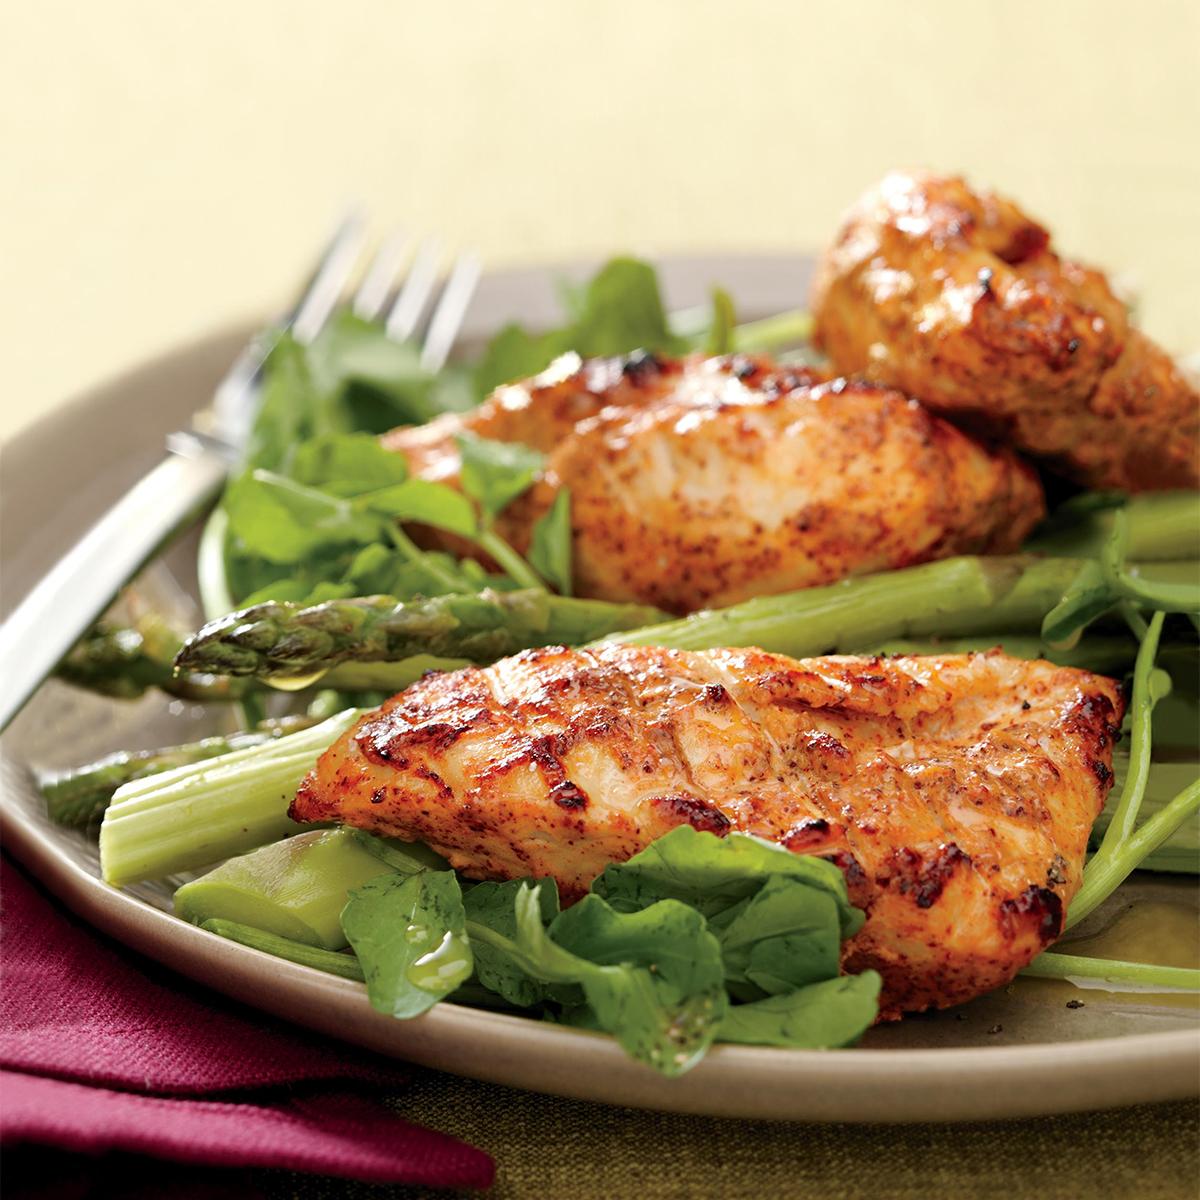 Yogurt-Marinated Chicken with Asparagus and Watercress